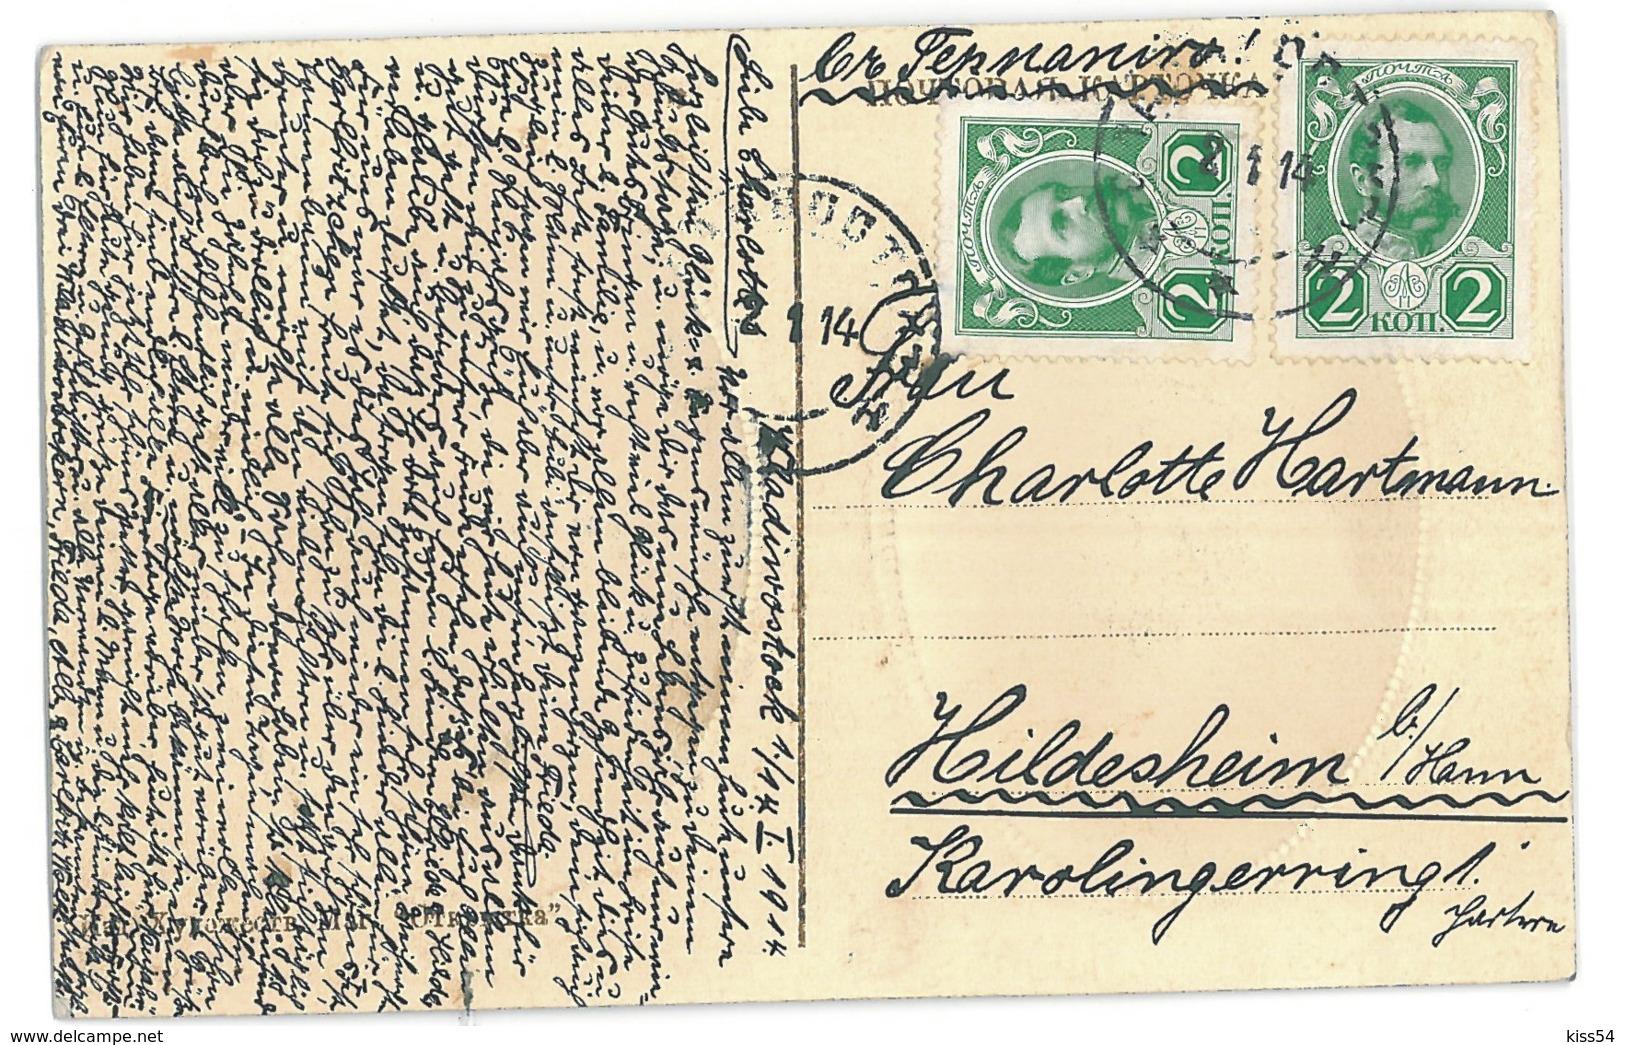 RUS 16 - 14441 VLADIVOSTOK, Chinese Quarter, Russia - Old Postcard, EMBOSSED - Used - 1914 - Russie